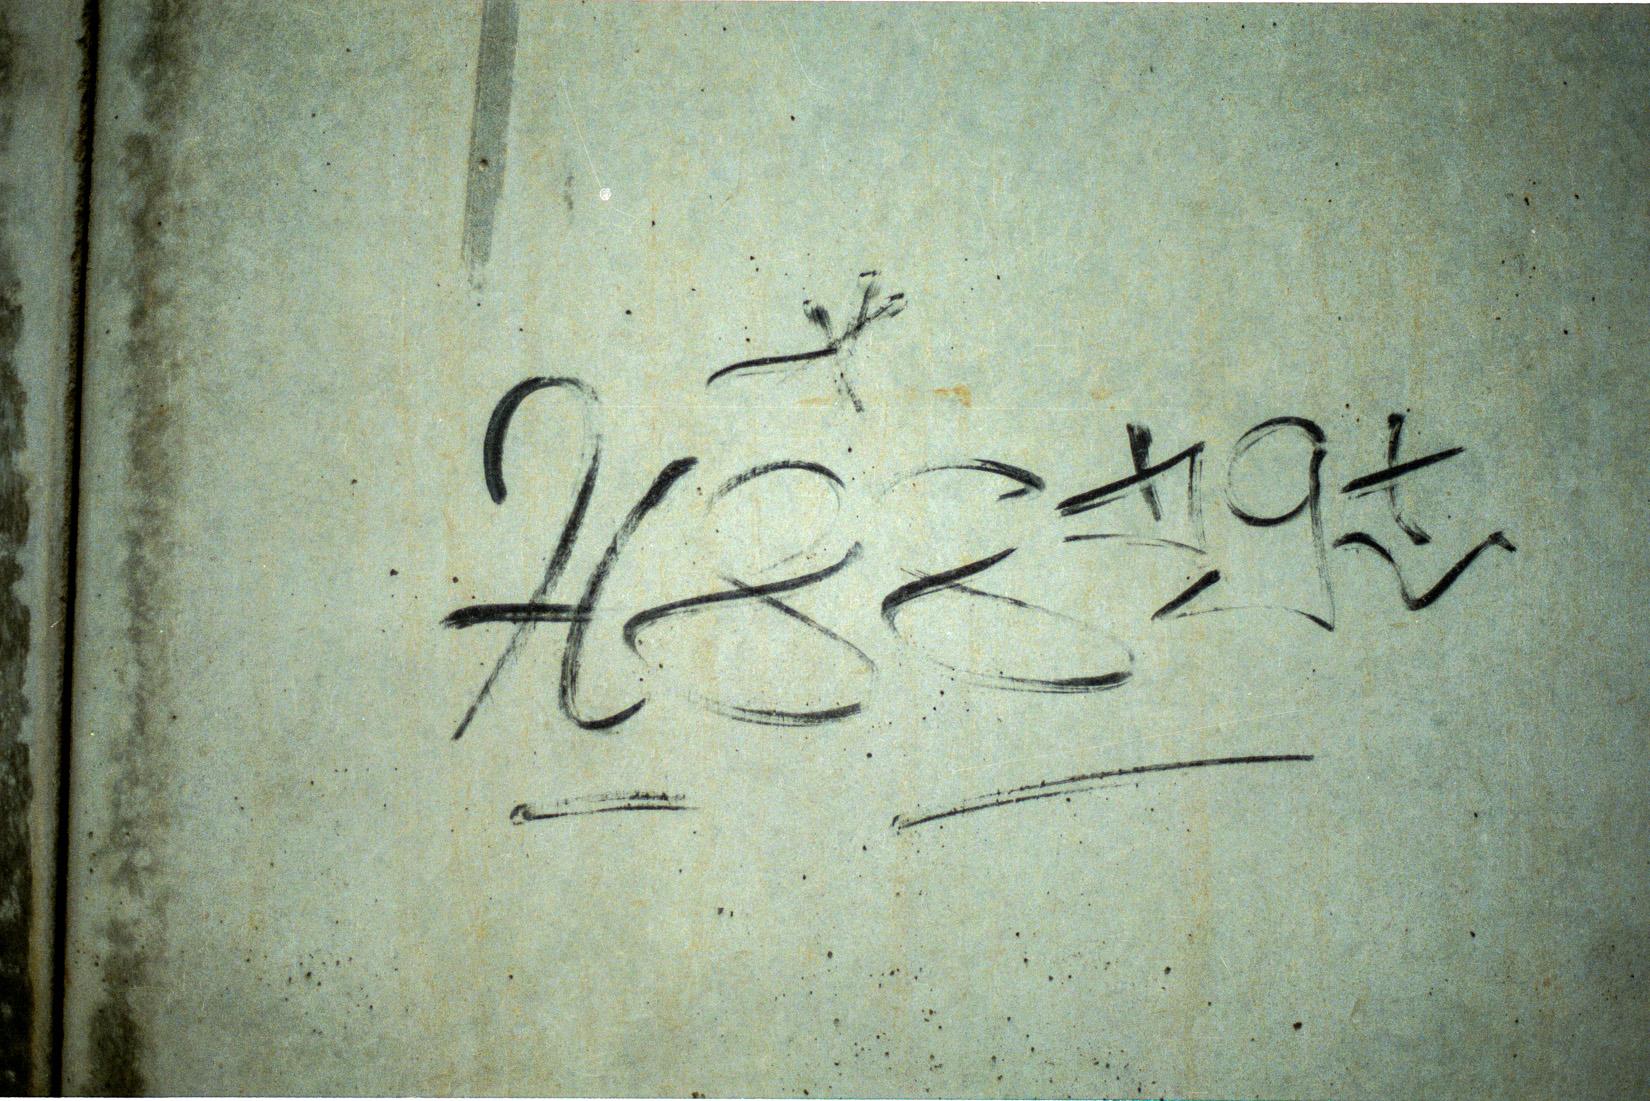 Frankfurt_Graffiti_1988_1989_H88_FRC (4 von 25)